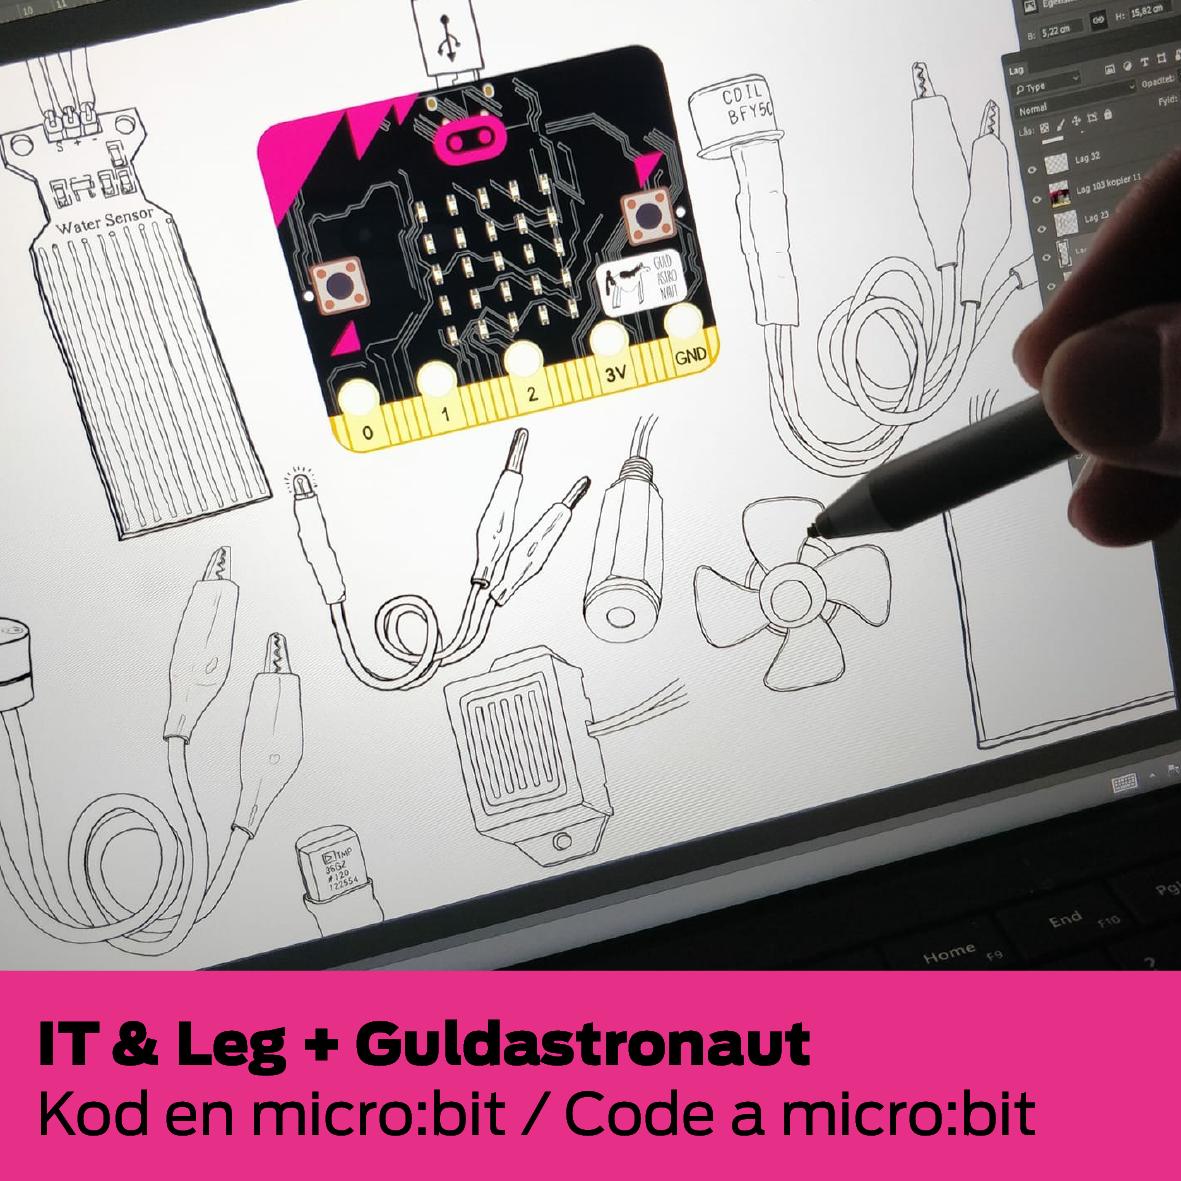 IT & Leg + Guldastronaut: Kod en micro:bit / Code a micro:bit